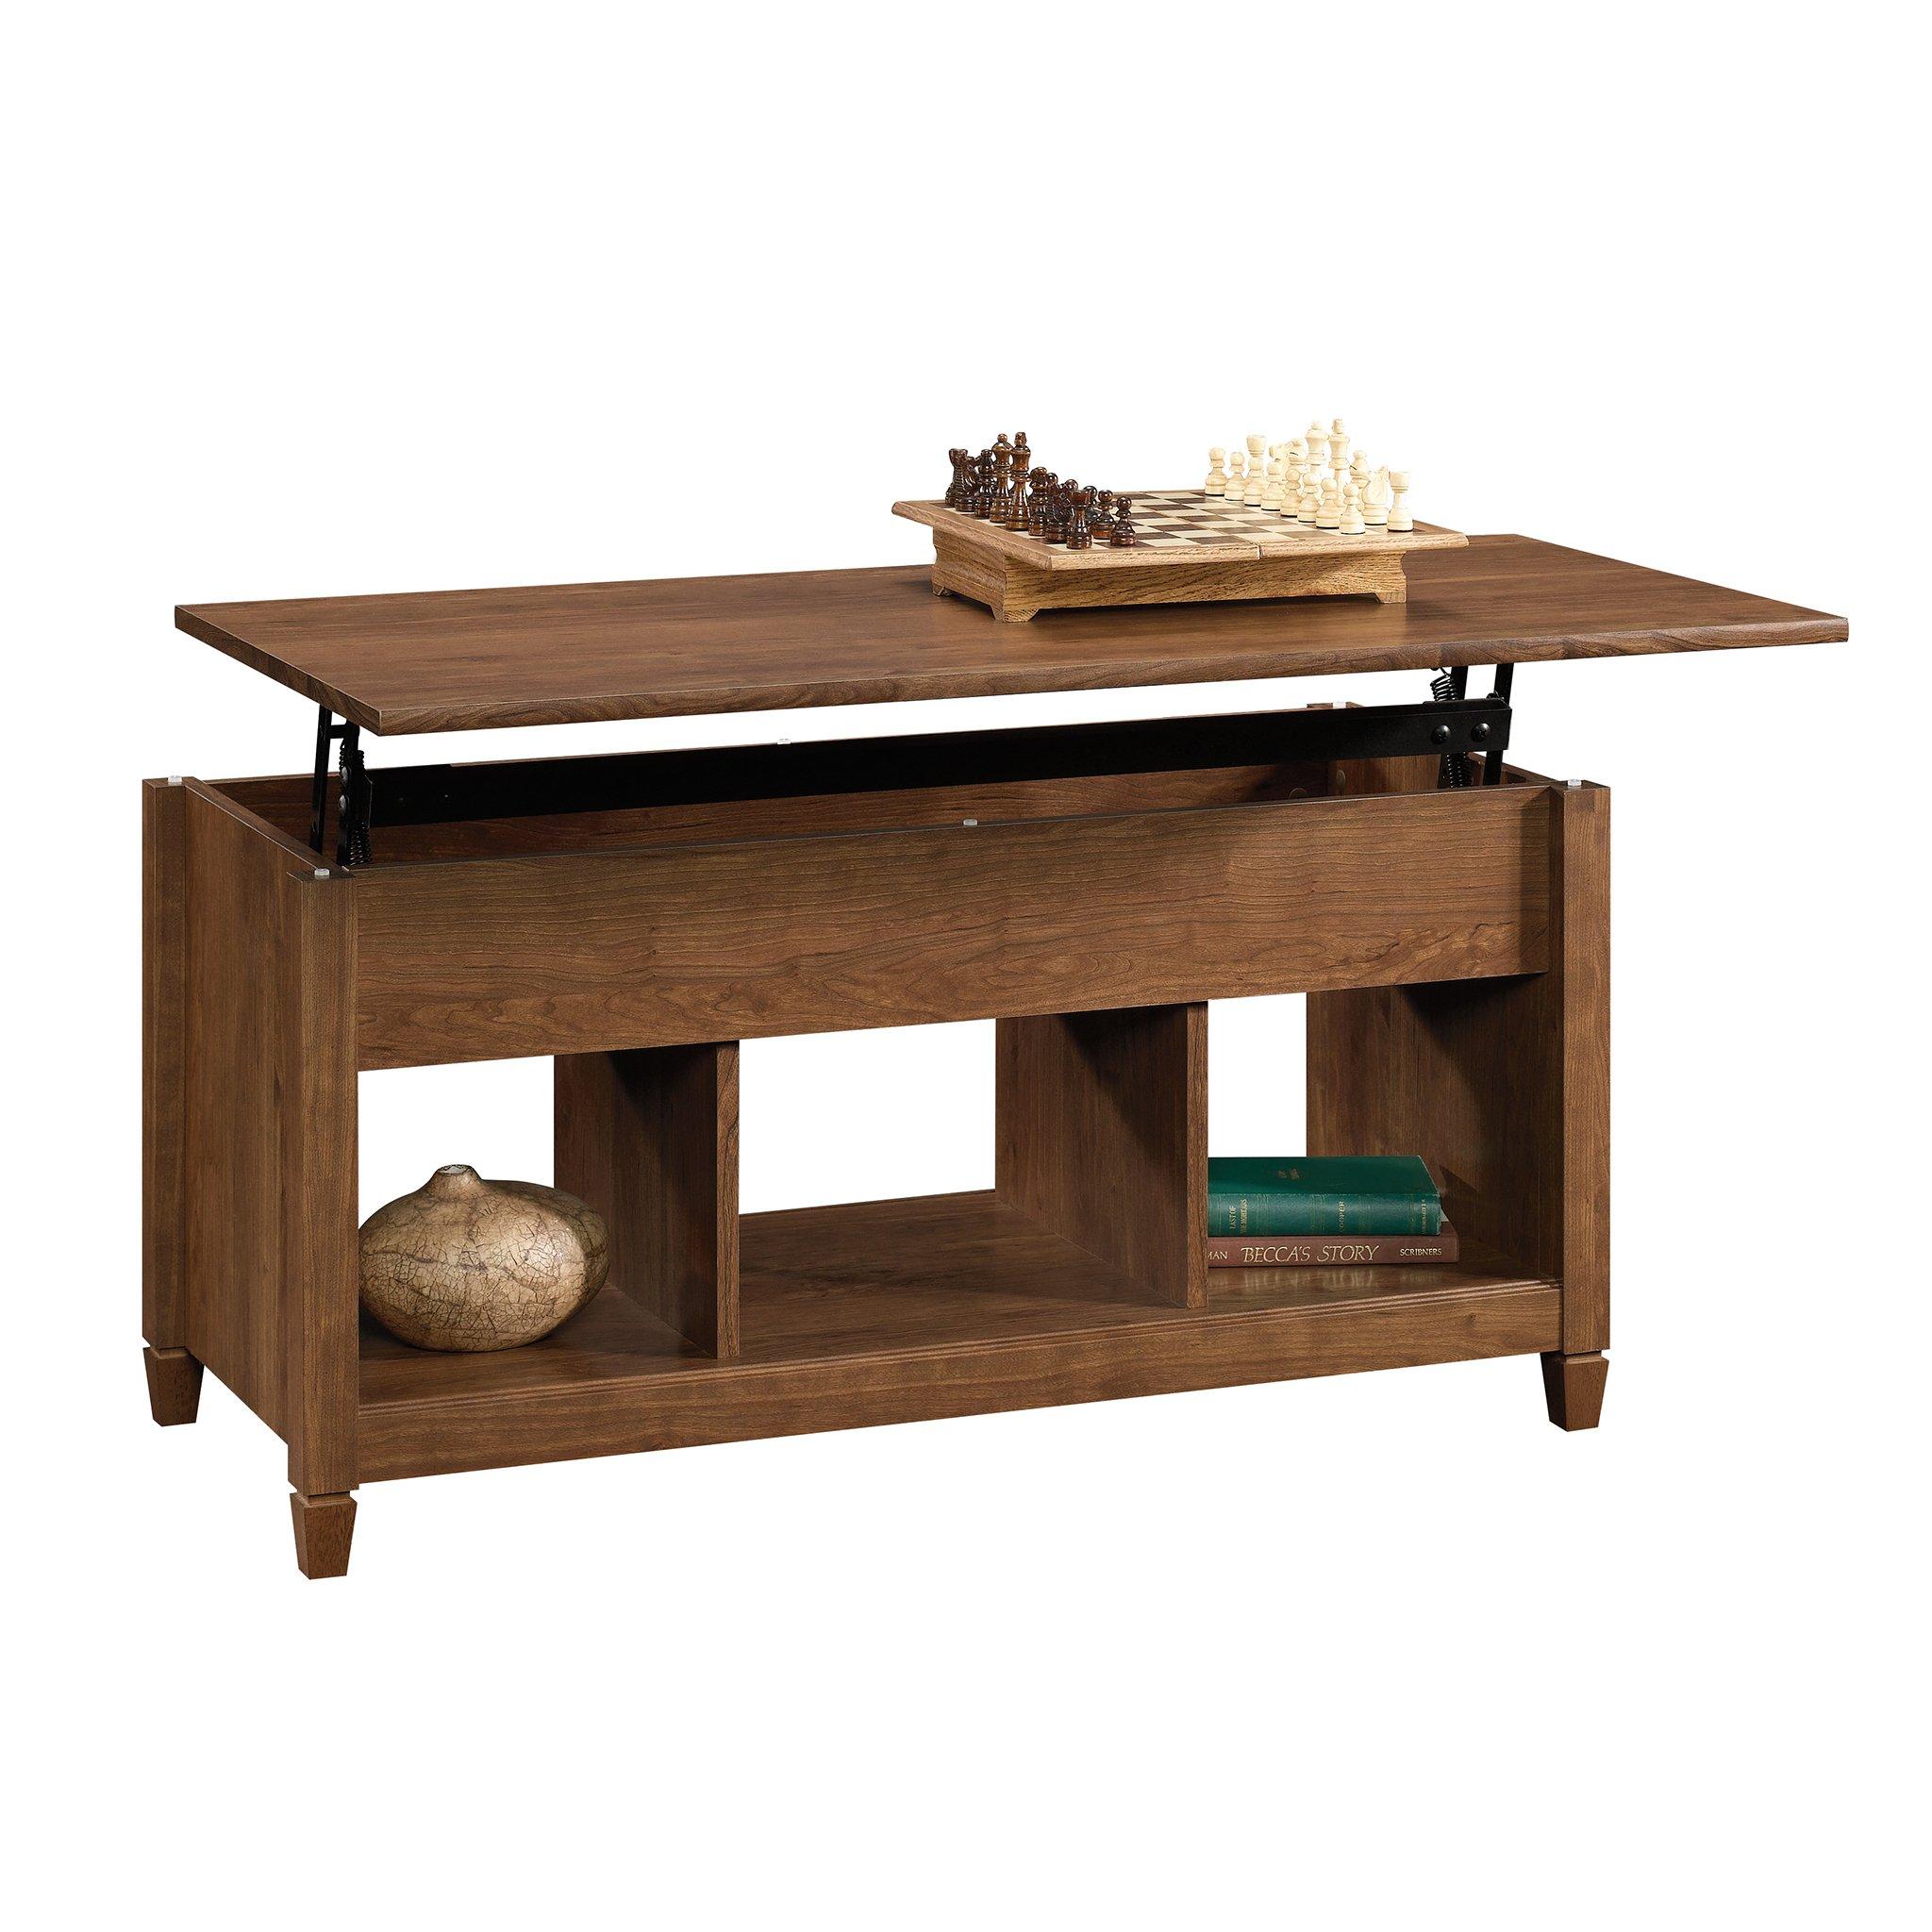 Sauder 419399 Coffee Table, Furniture, Auburn Cherry